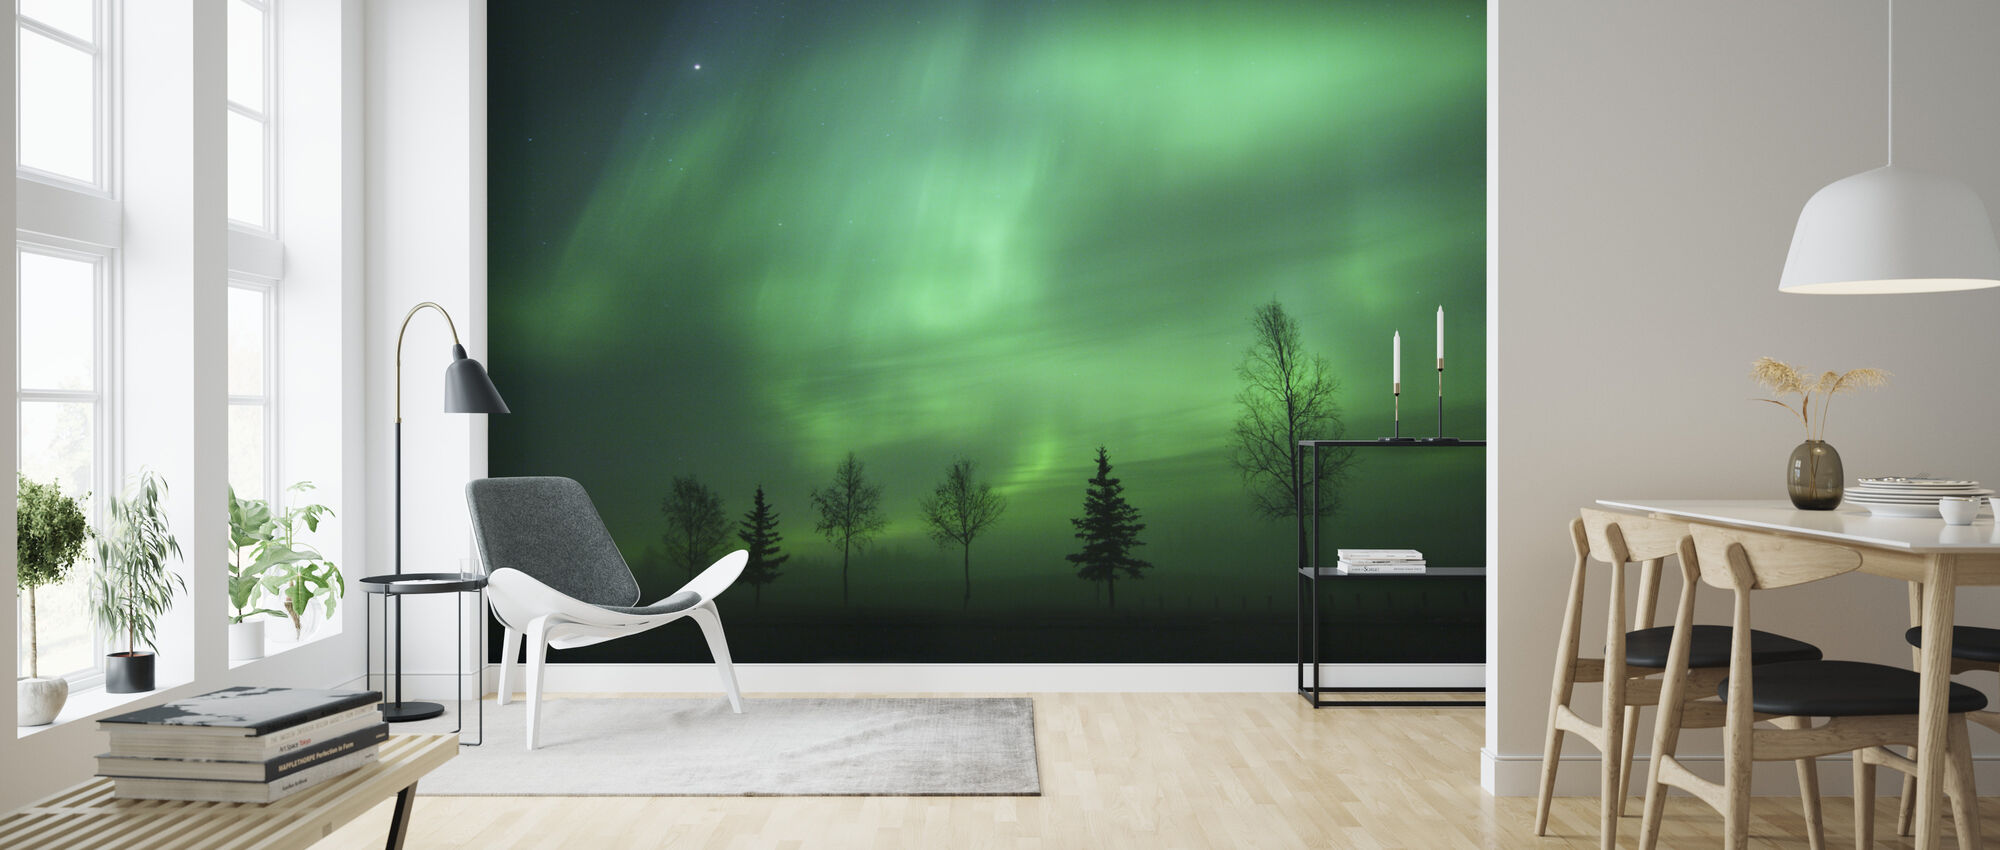 Nordic Lights - Wallpaper - Living Room